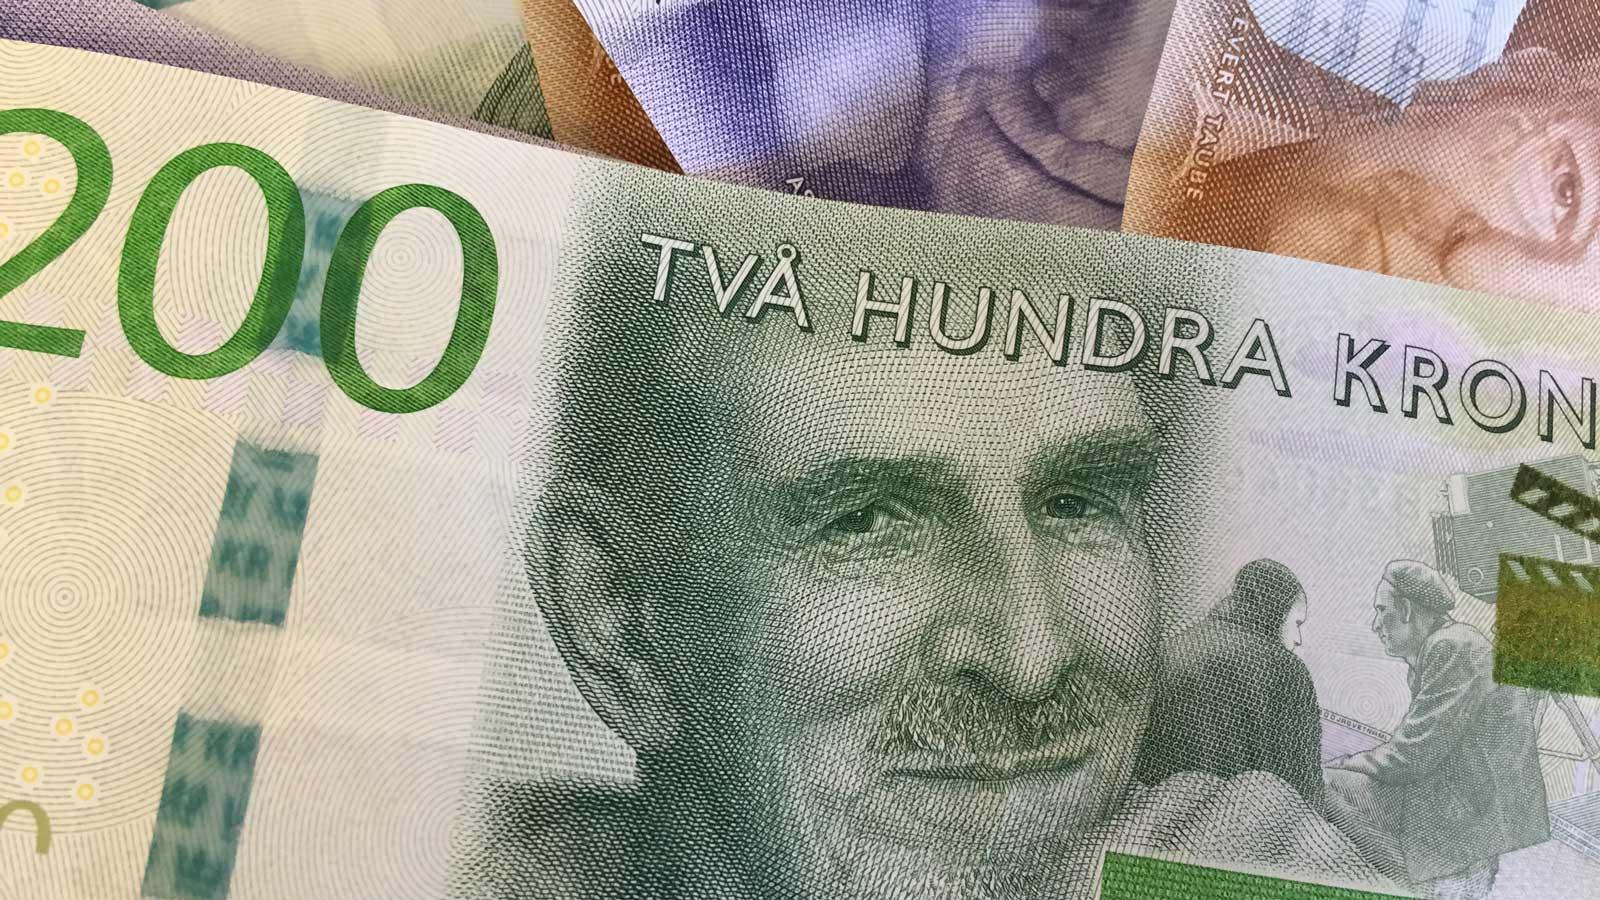 Pengar. Foto: Lisbeth Svensson